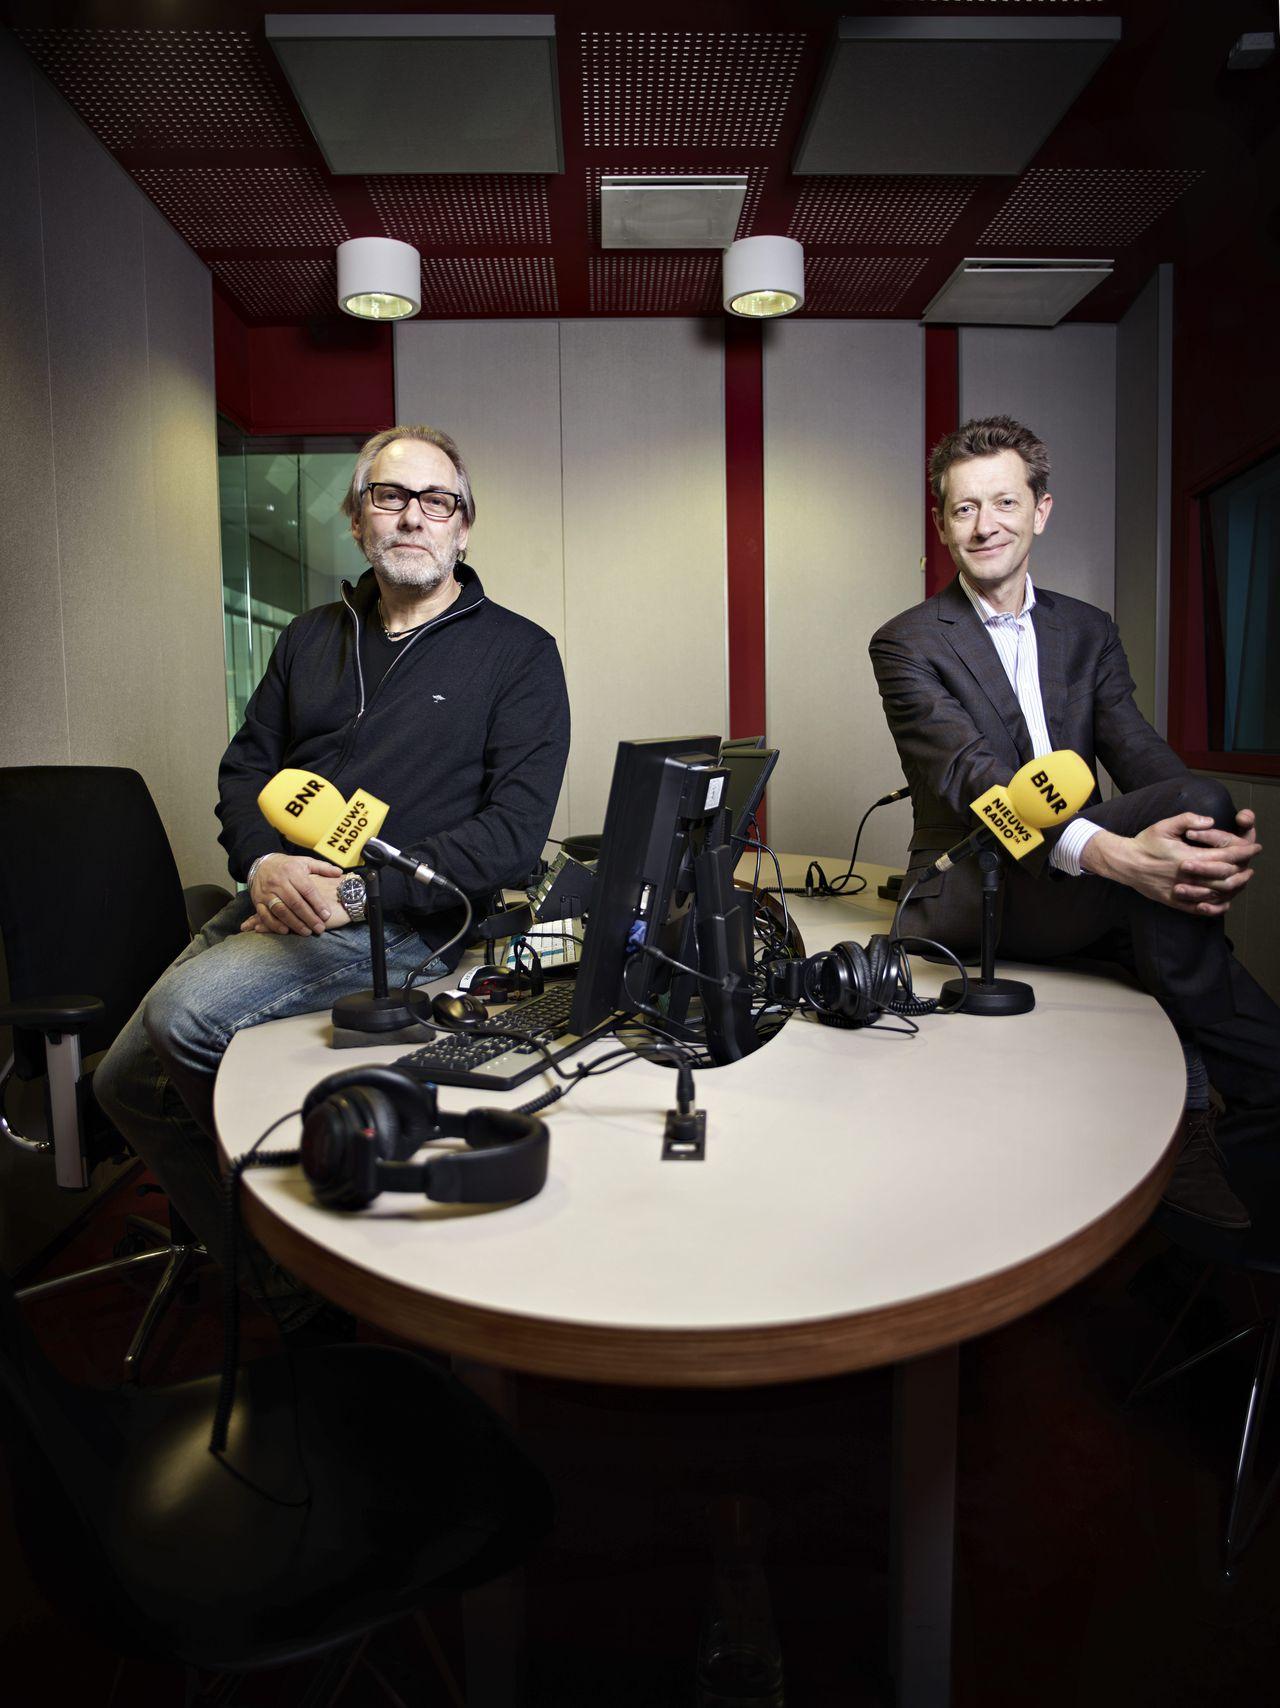 Nederland, Amsterdam, 14 november 2012 Laurens Borst (radio 1) en Paul van Gessel (BNR) (r) Foto: Merlijn Doomernik